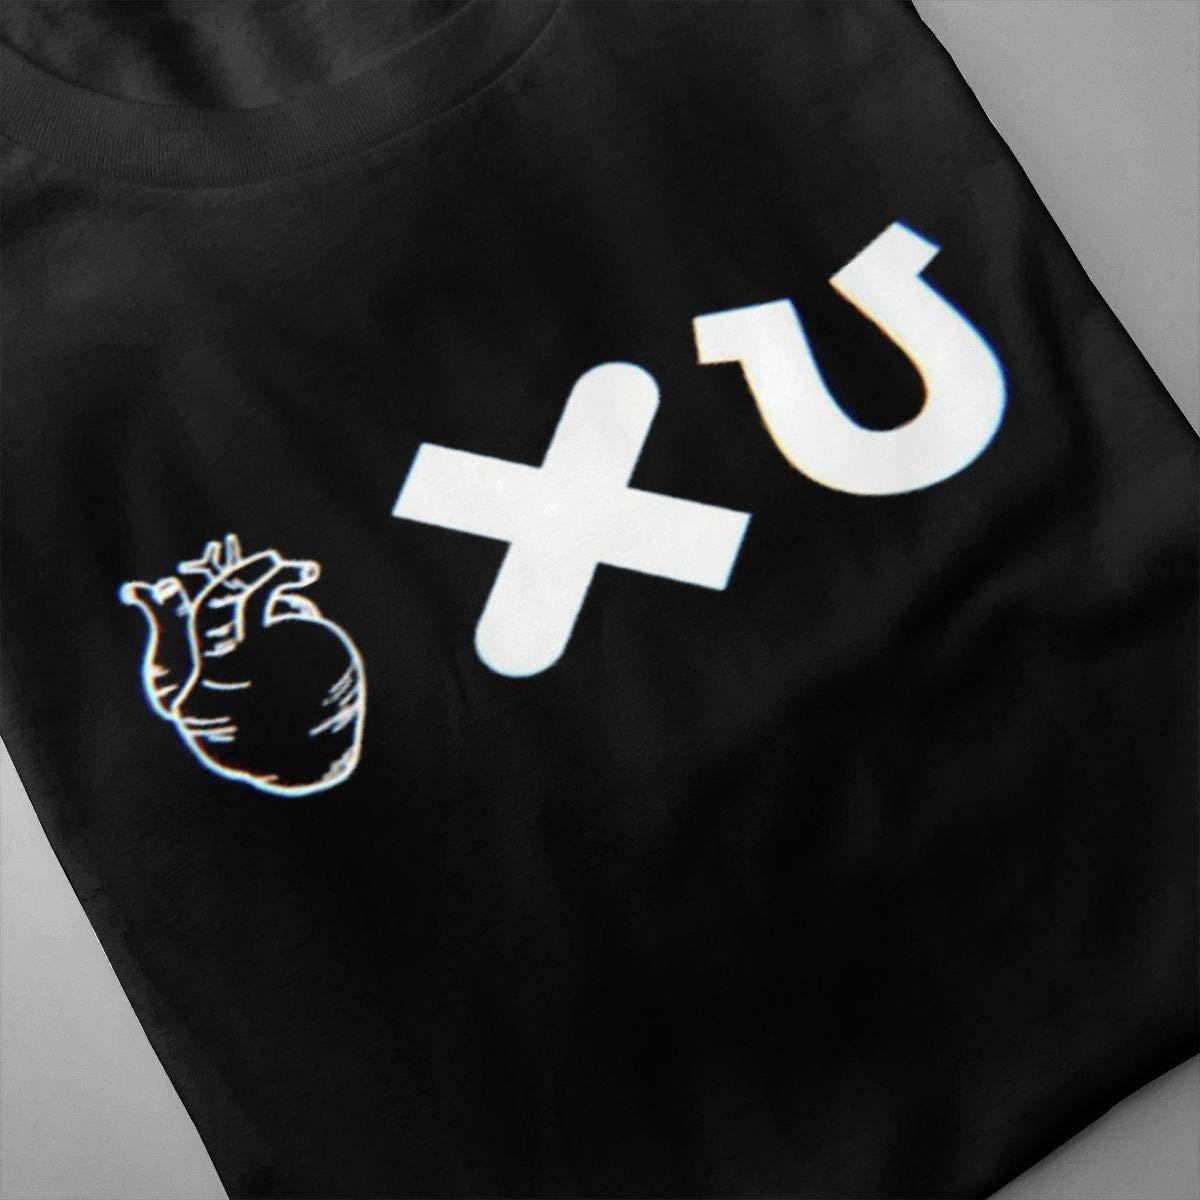 SHENGN Men Printing Casual Lucky Love Death Robots Logo Short Sleeve Classic T Shirt Black